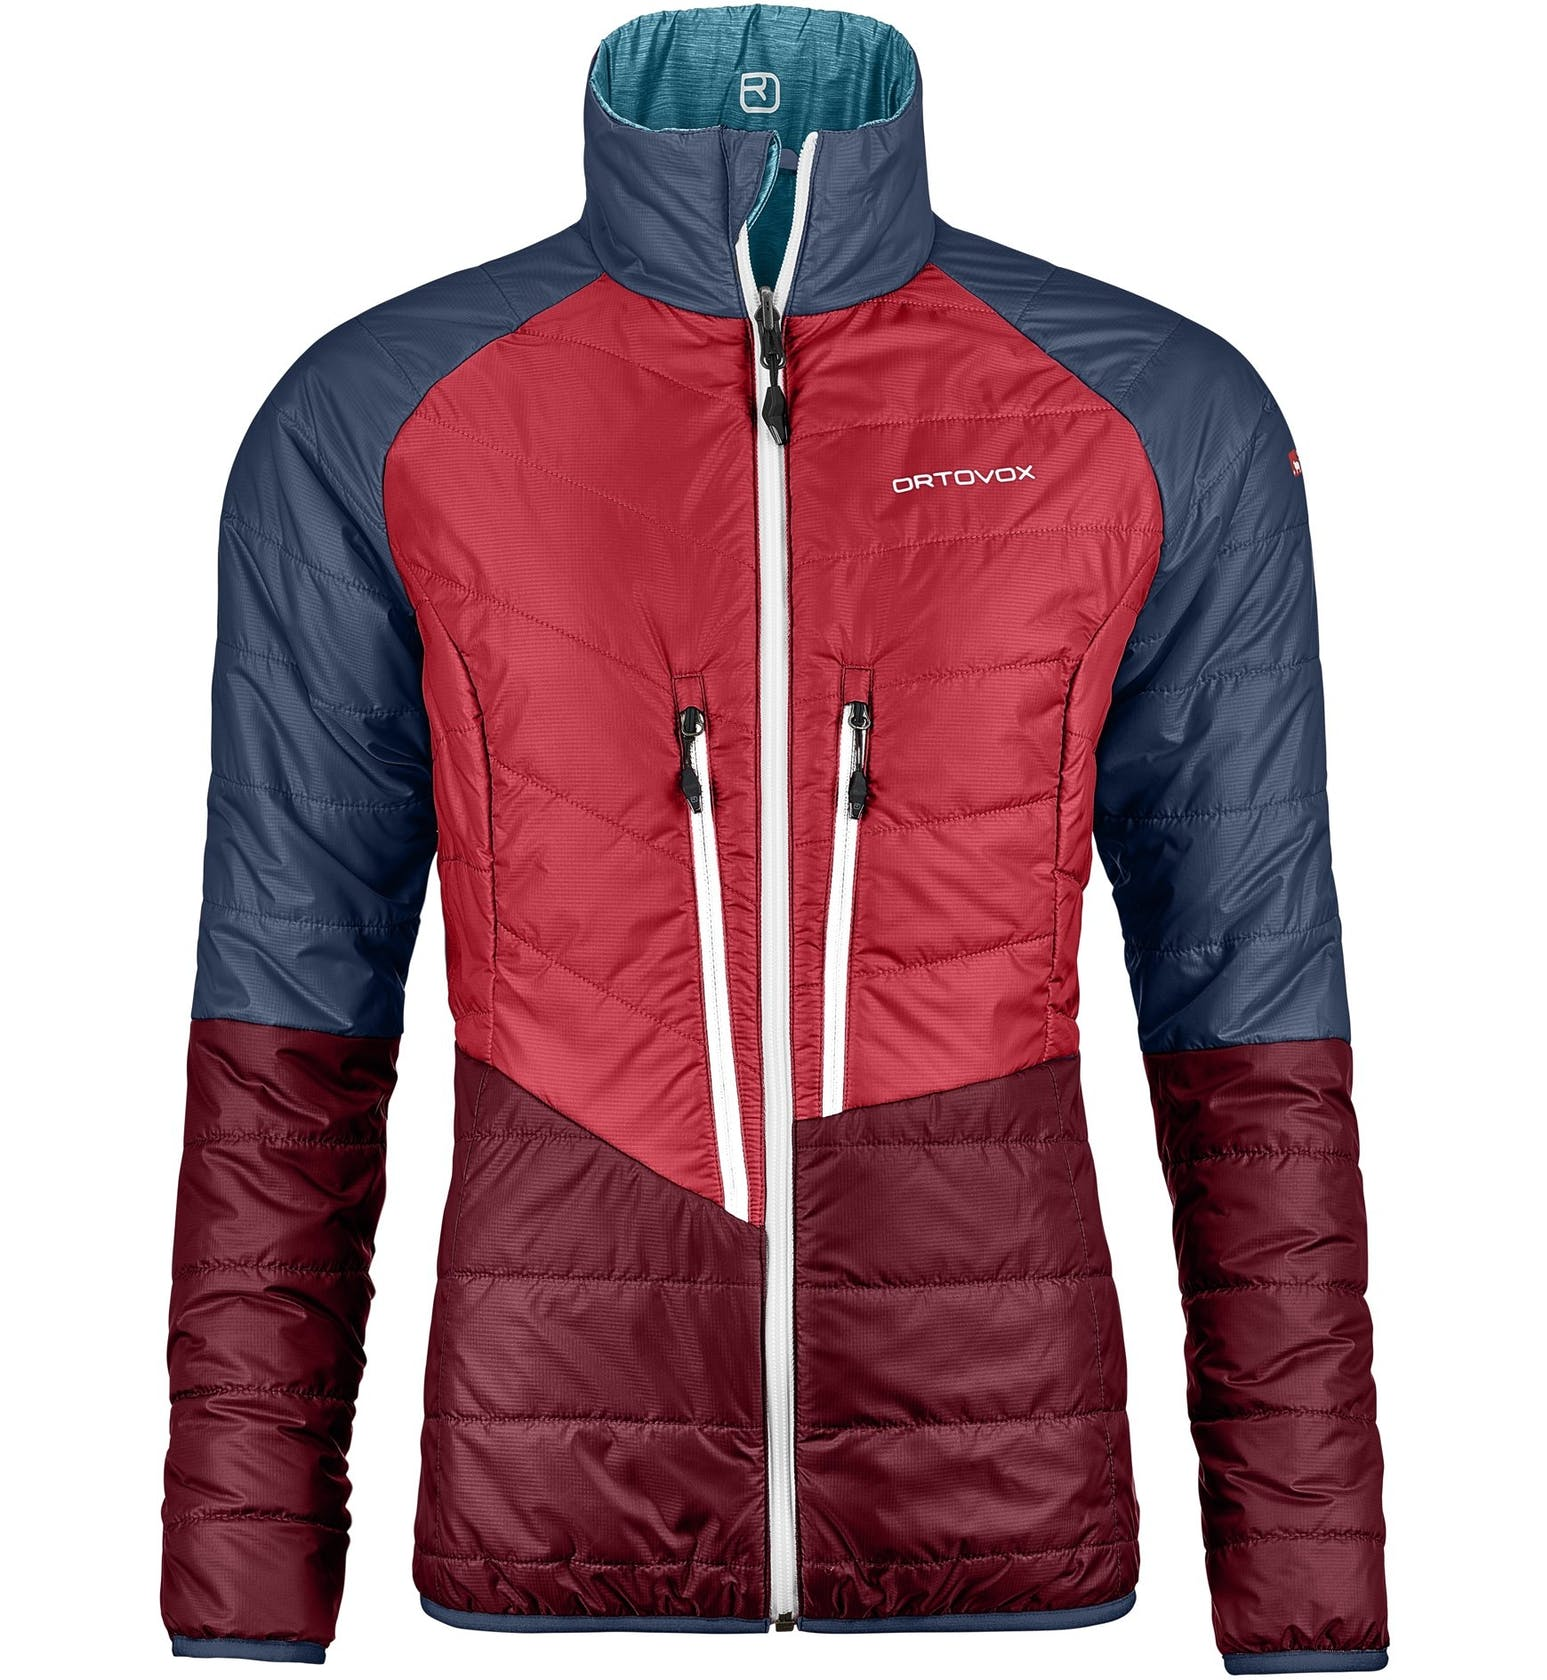 Ortovox Piz Bial - wendbare Bergsportjacke - Damen